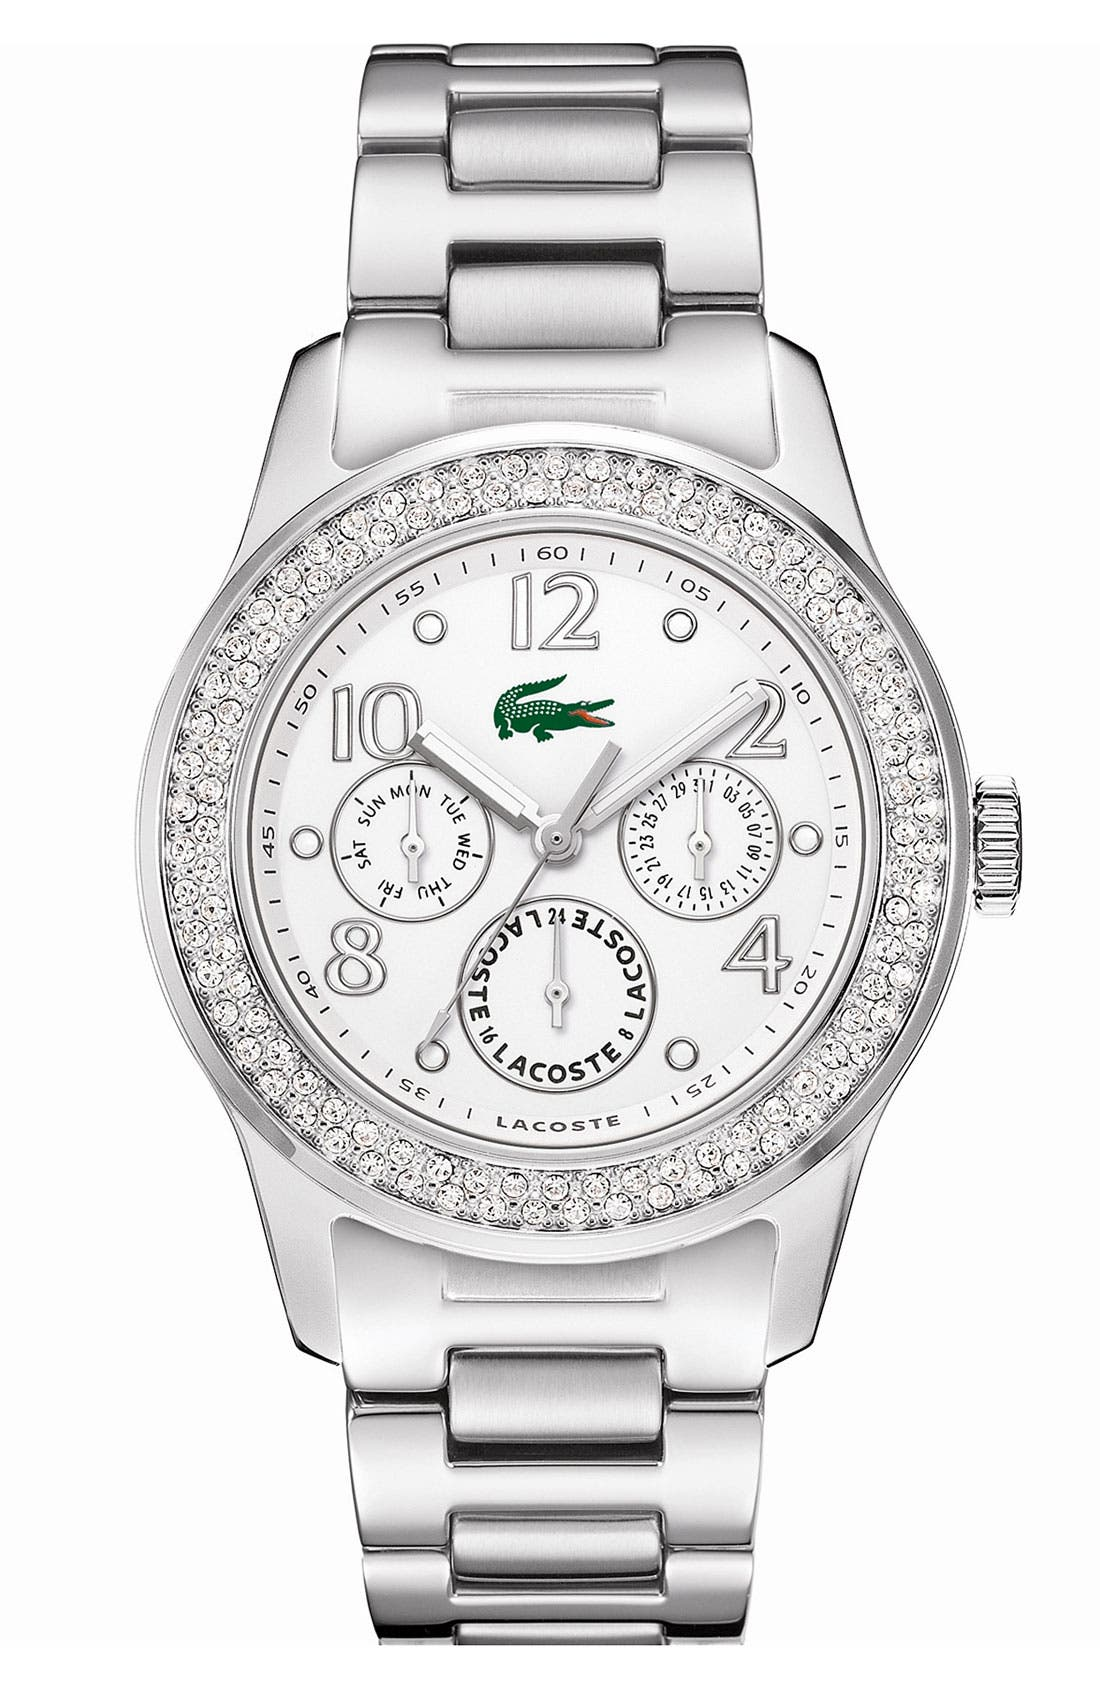 Main Image - Lacoste 'Advantage' Crystal Bezel Watch, 38mm